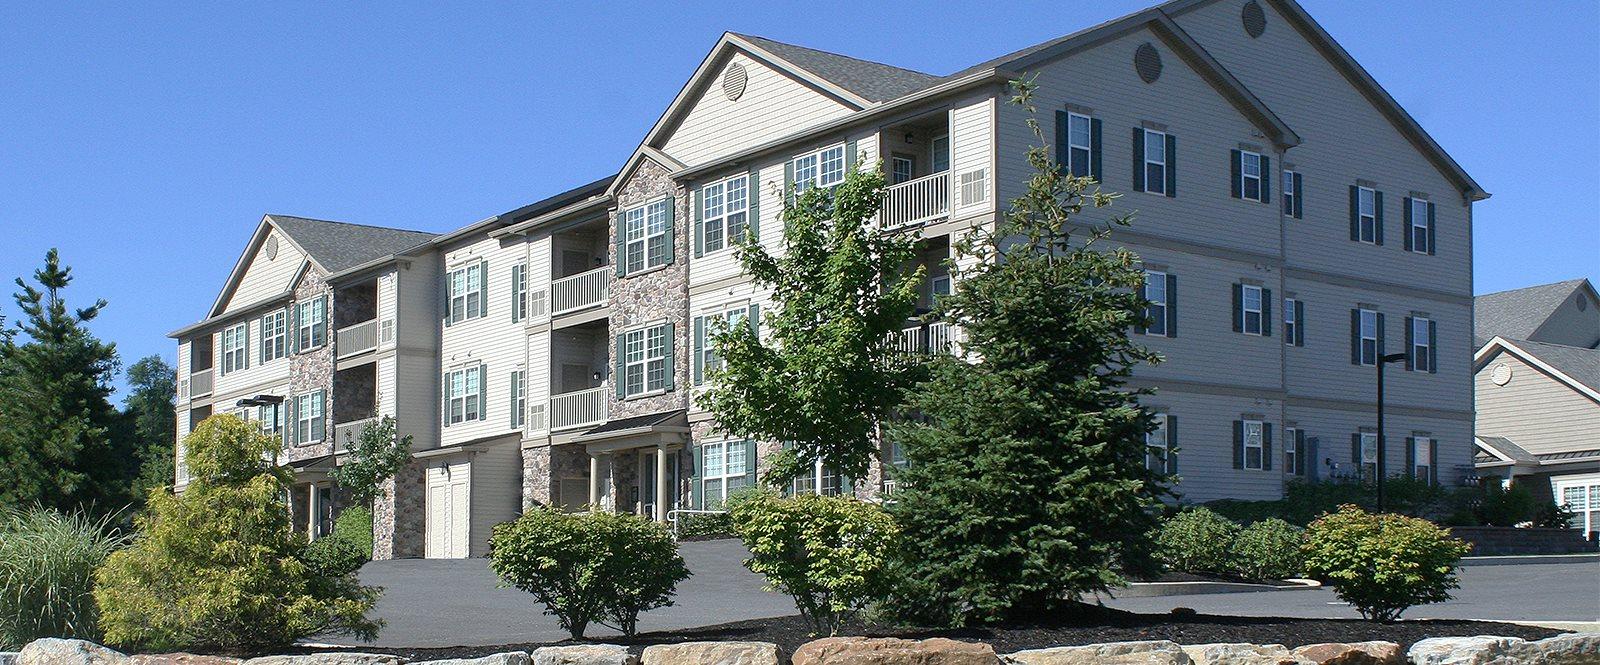 Cedar Park Community Apartments In Williams Township Pa